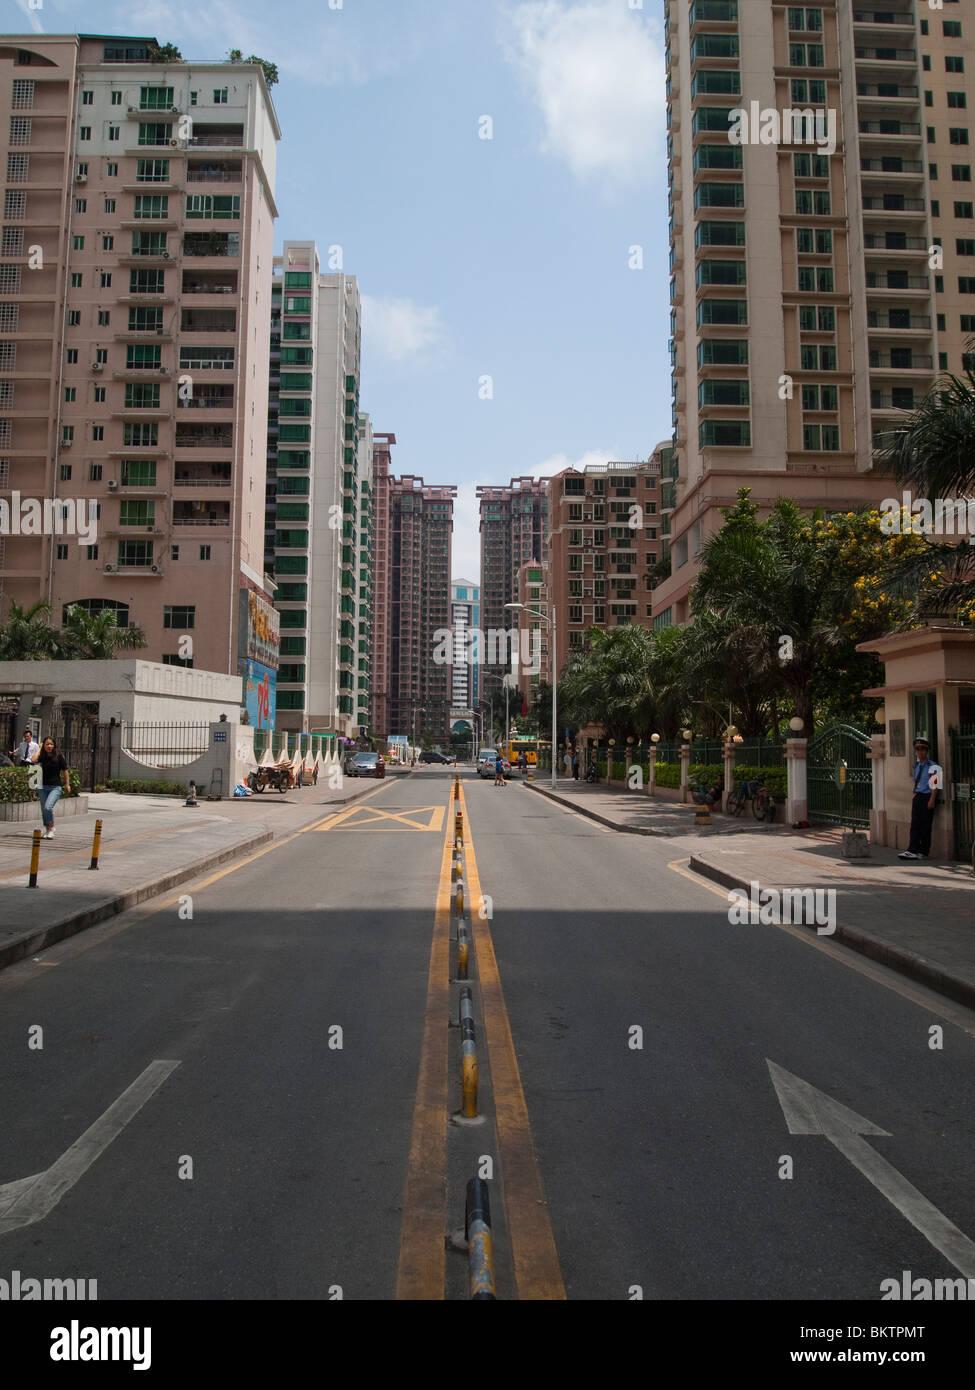 Futian District, Shenzhen, China - Stock Image